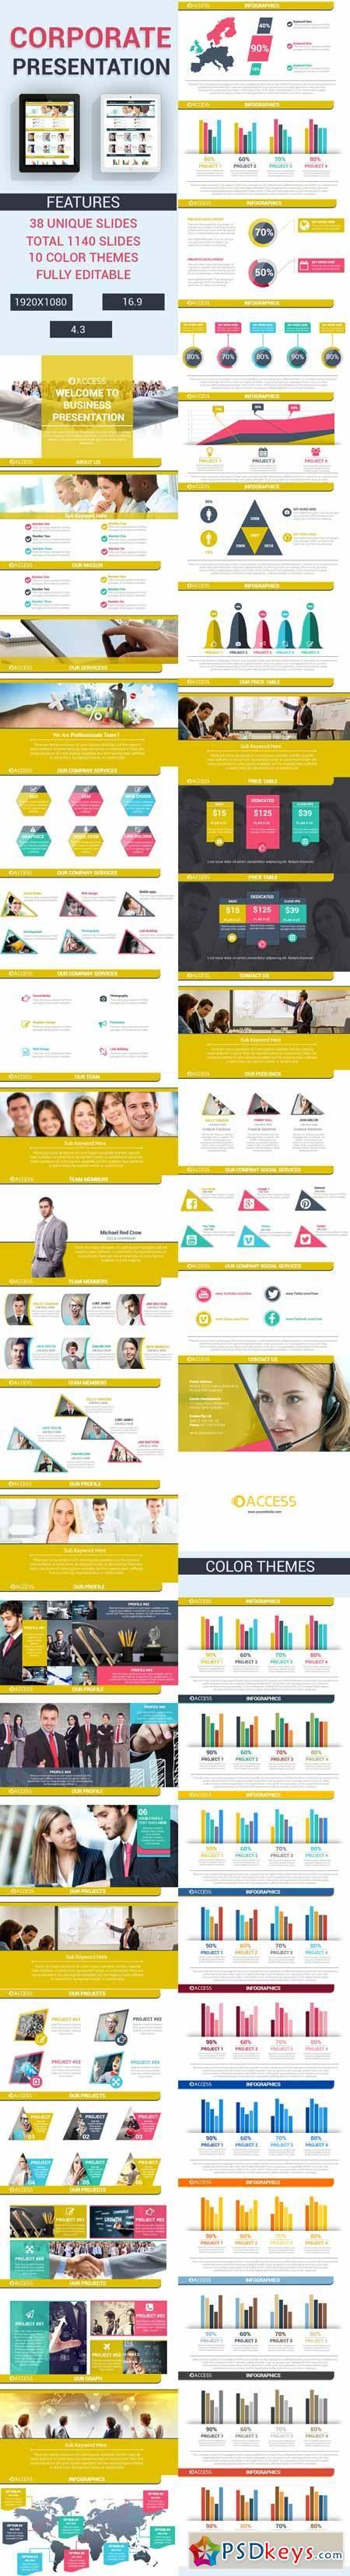 Corporate Presentation Powerpoint Template 11708340